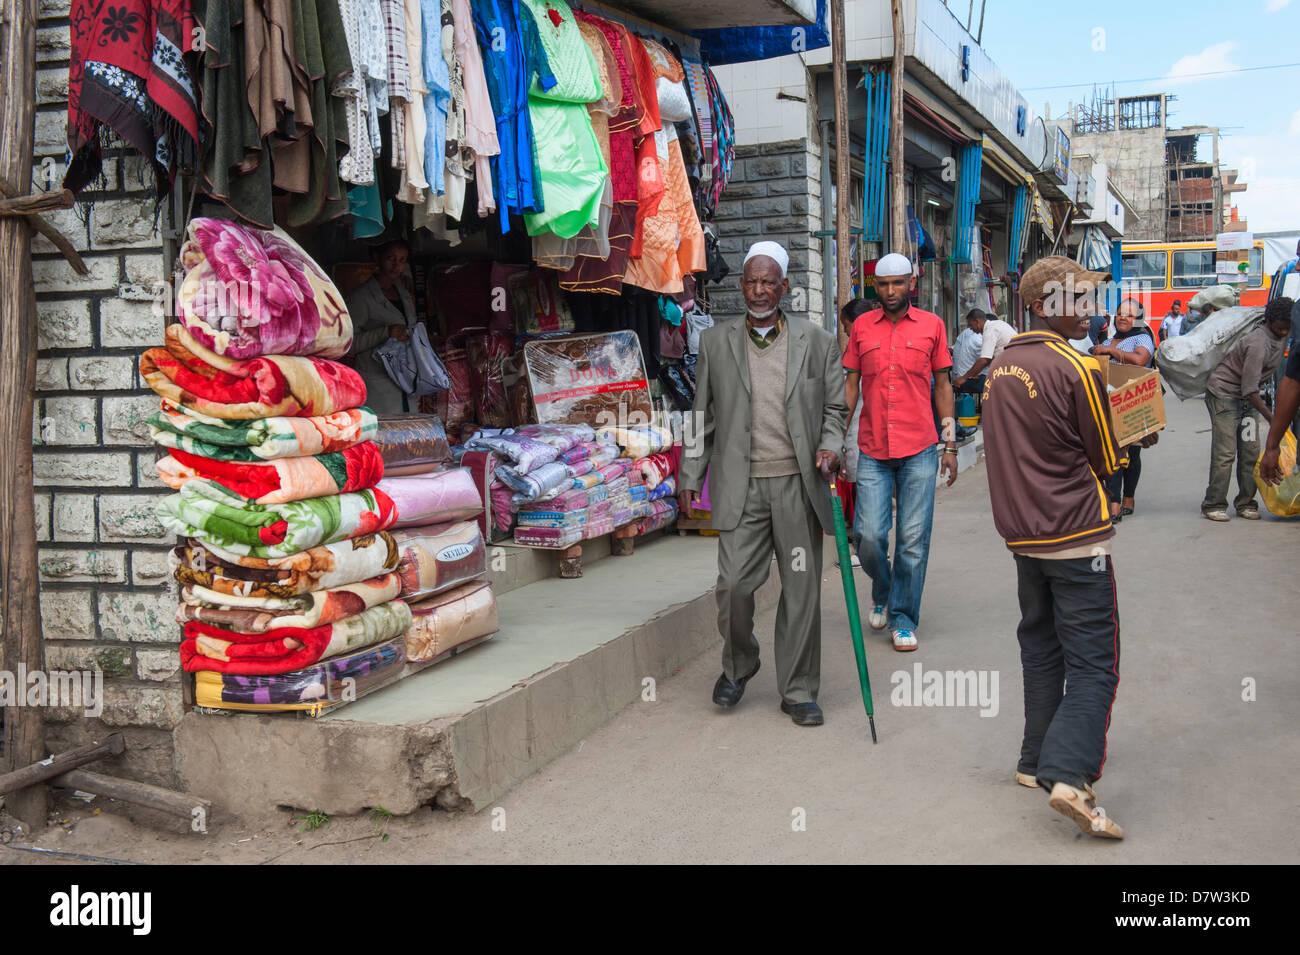 Market street scene, Mercato of Addis Ababa, Ethiopia - Stock Image